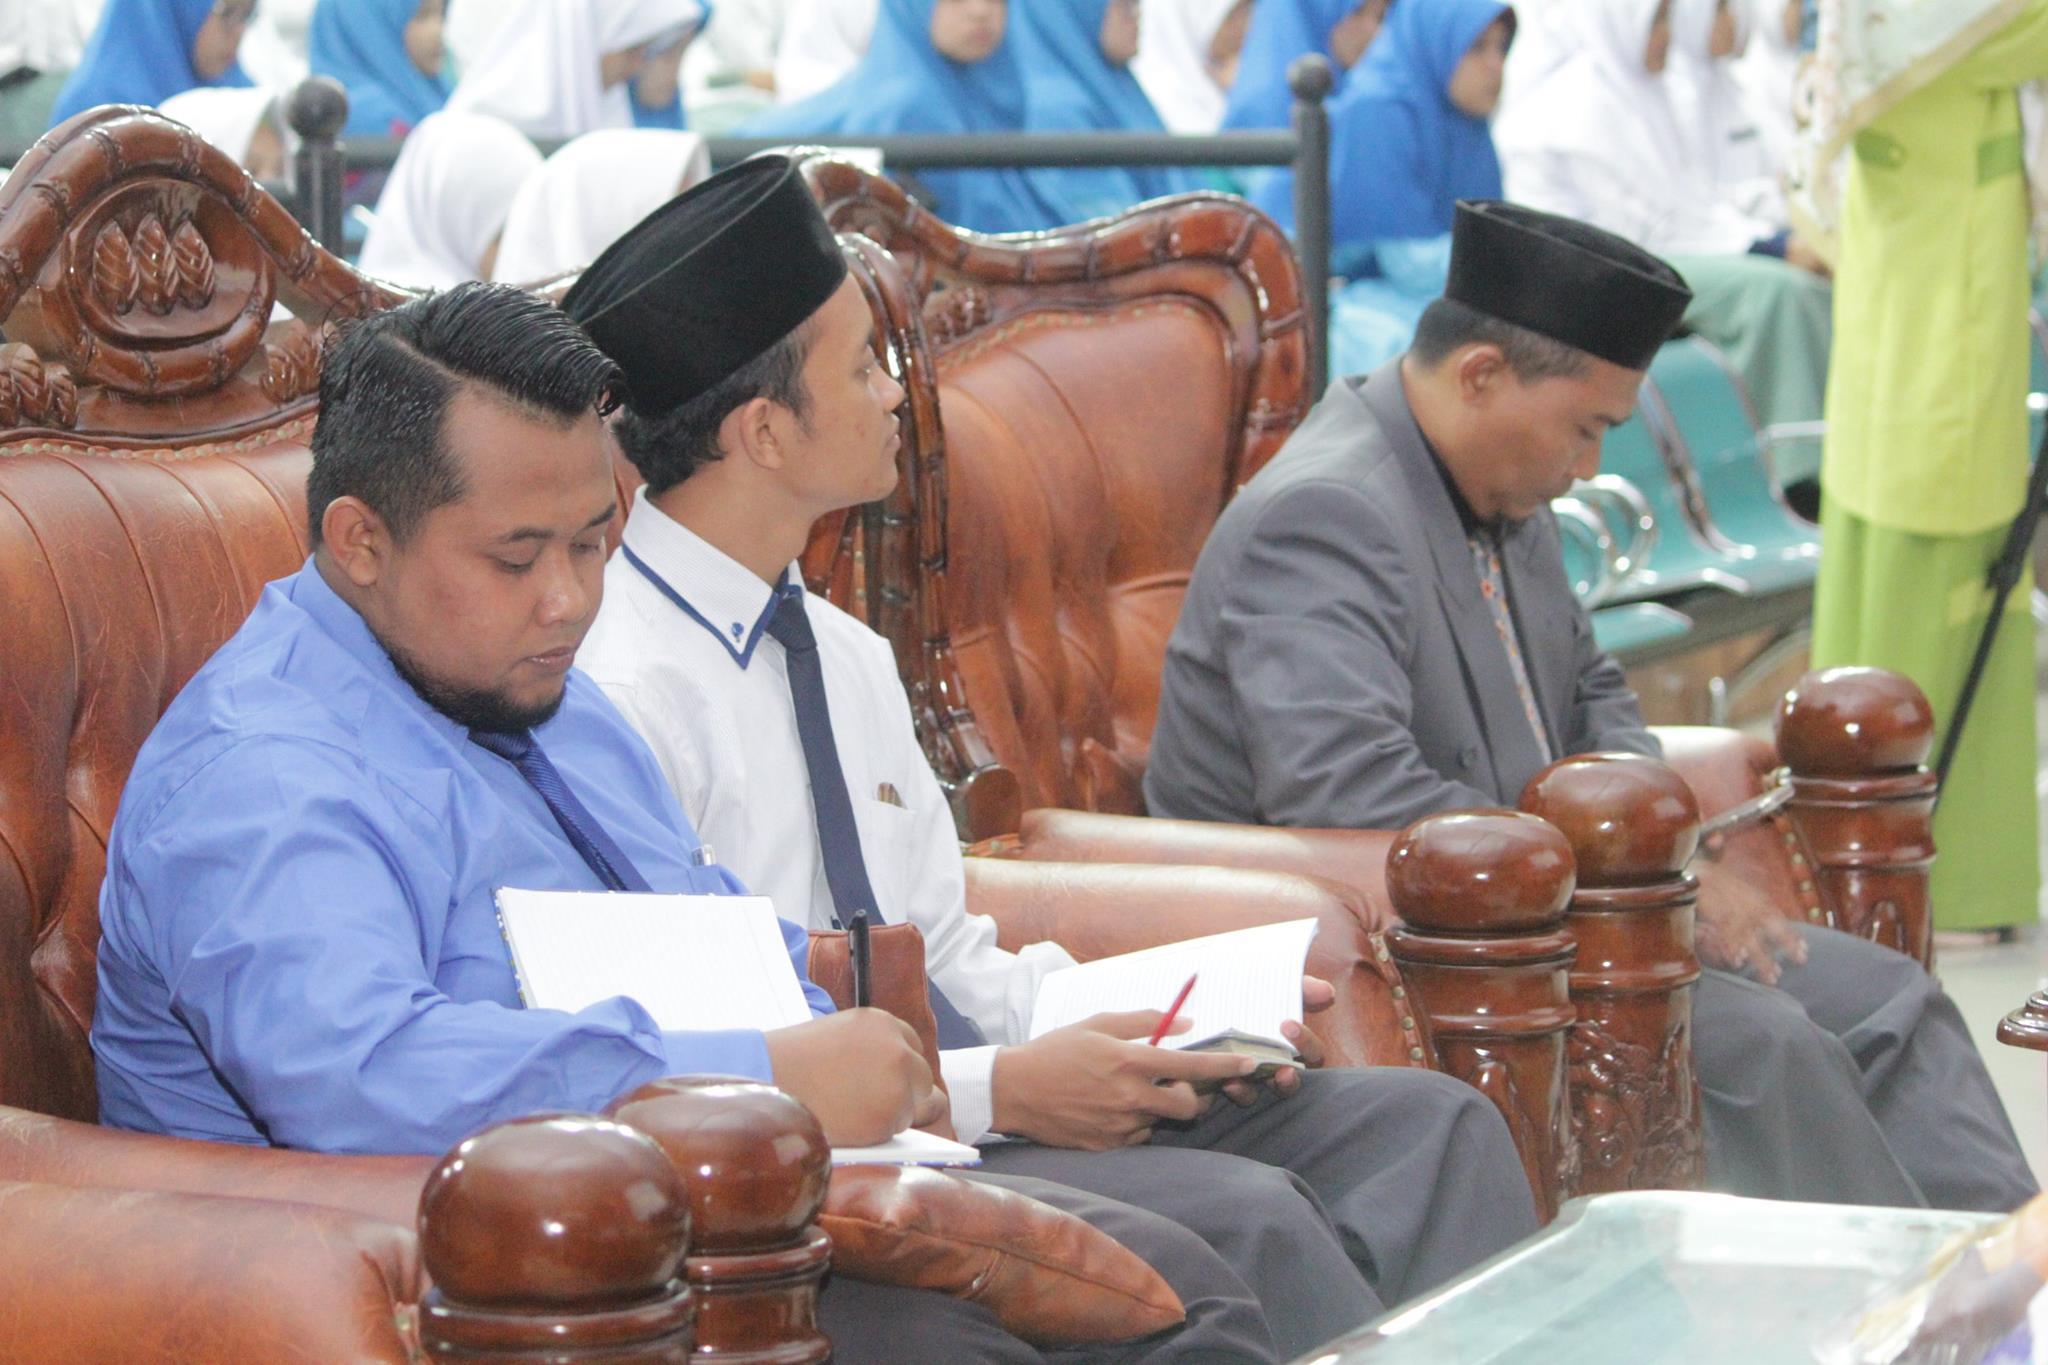 Kunjungan KH. Ahmad Suharto, M. Pd. I Wakil Pengasuh Pondok Modern Darussalam Gontor Putri 1